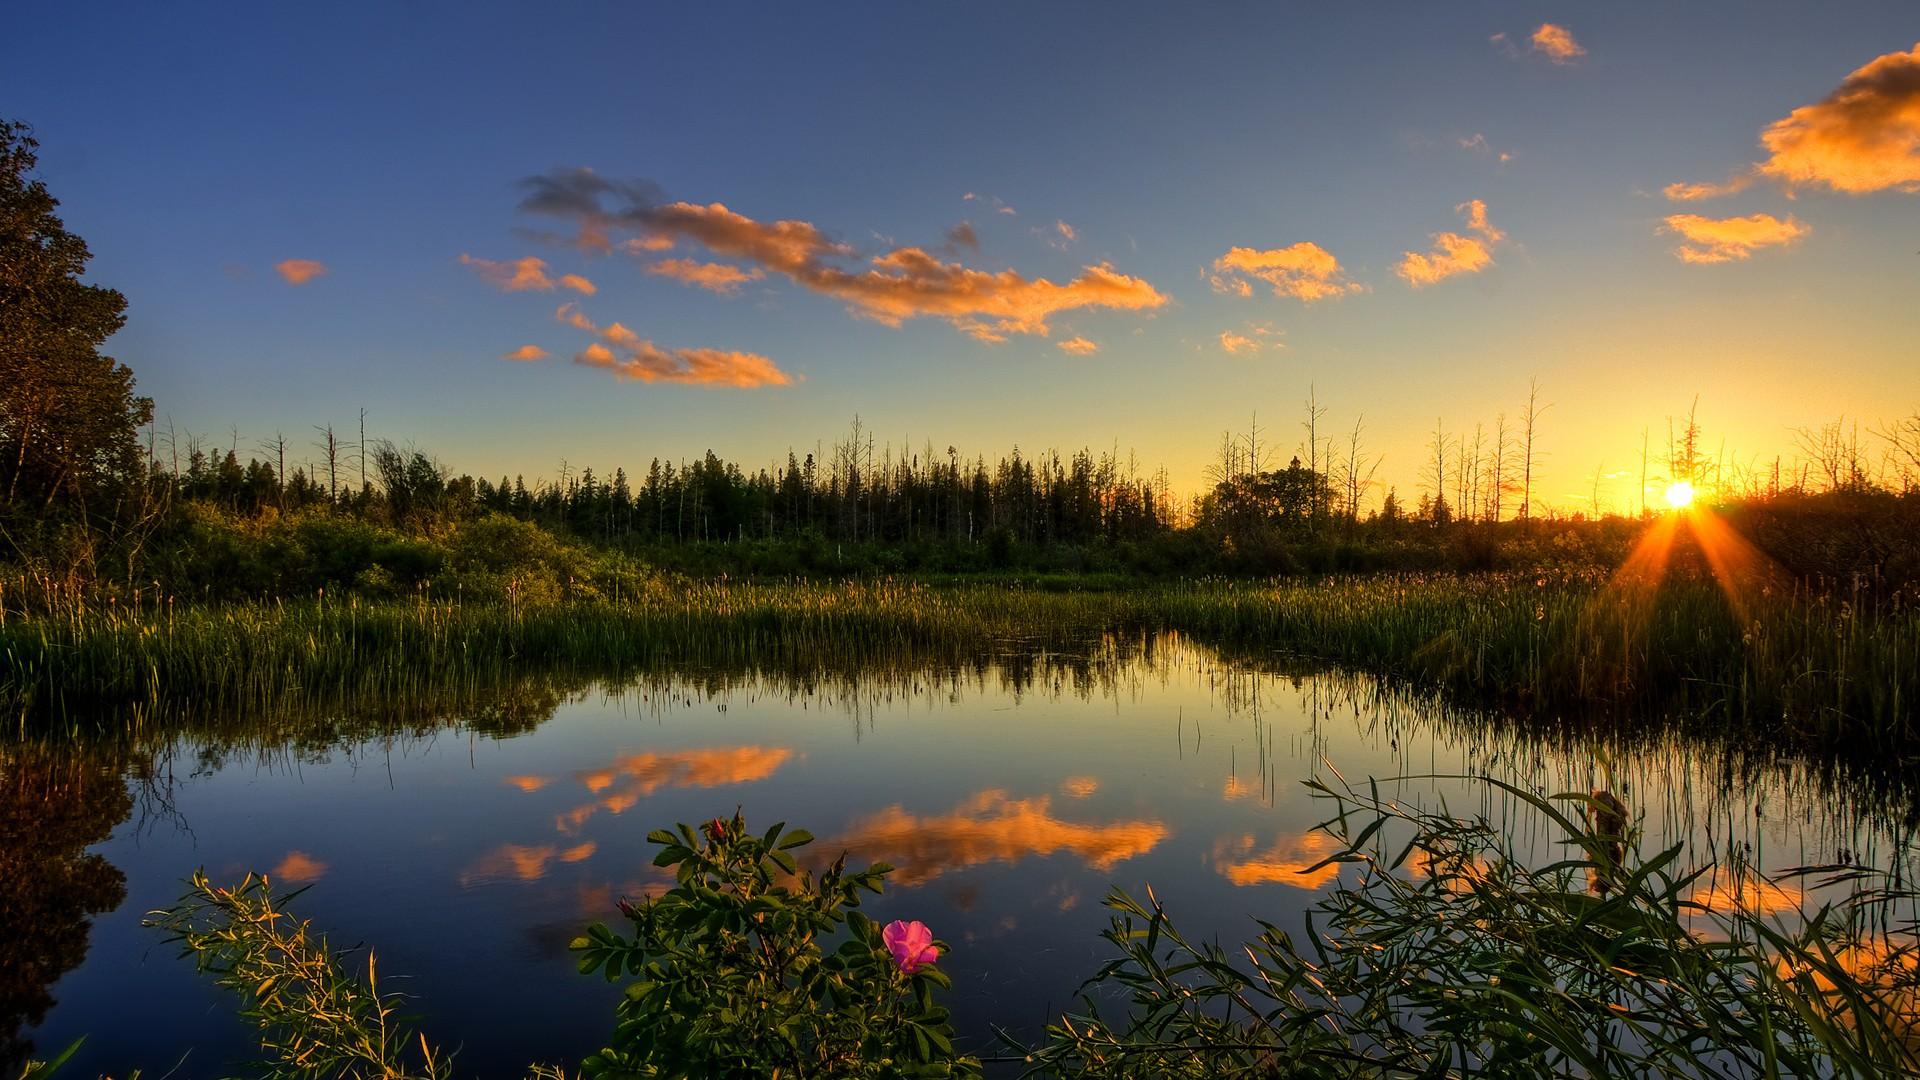 General 1920x1080 nature sunset lake